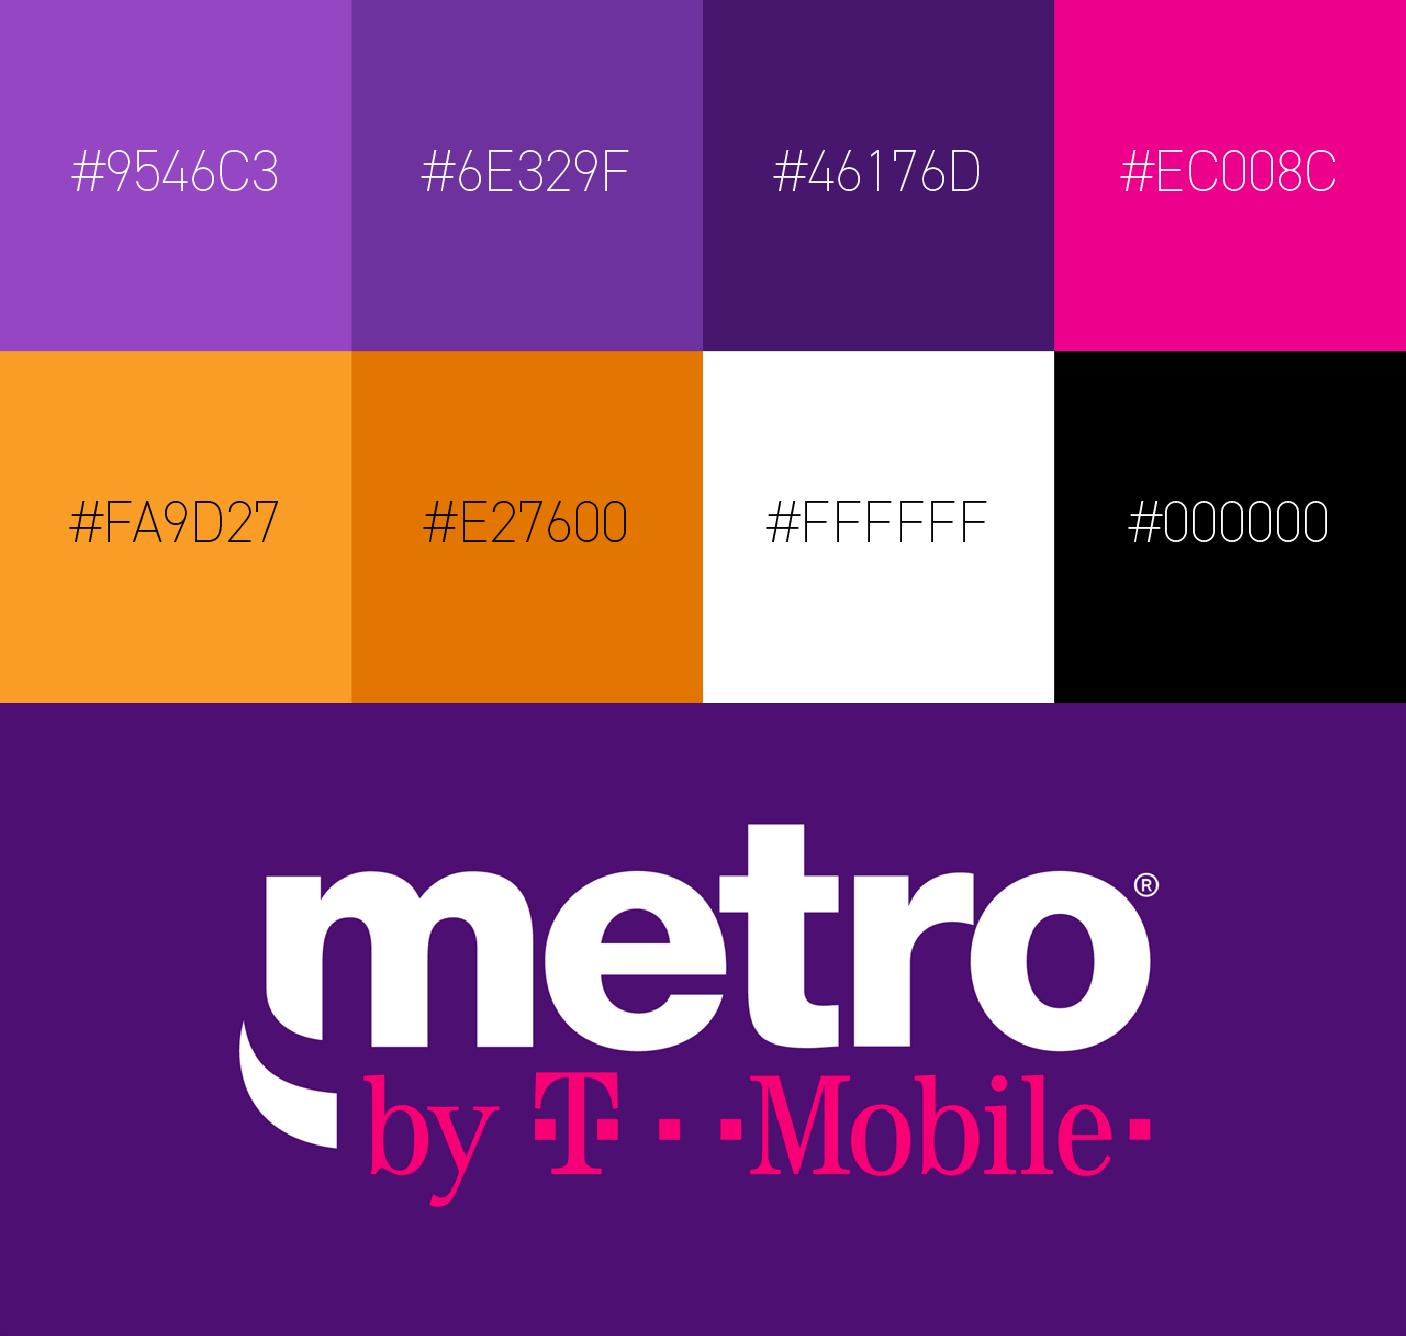 Metro Exodus Announced And Coming 2018 Industry News Metro Last Light Metro Exodus